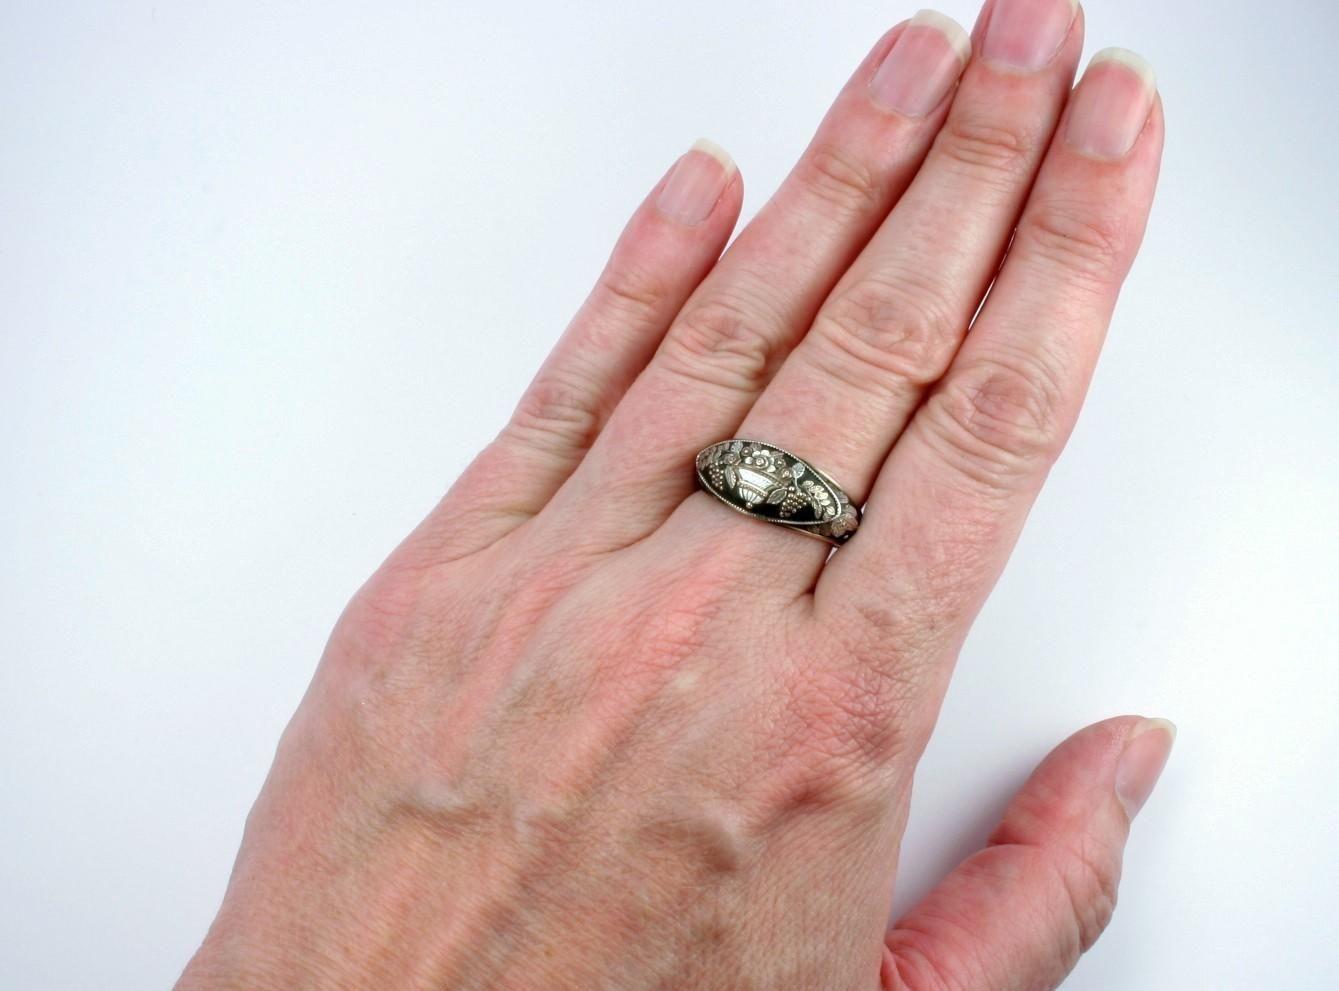 Rare Berlin Iron Giardinetti Ring, c. 1790 - 1815 | Iron, Ring shops ...